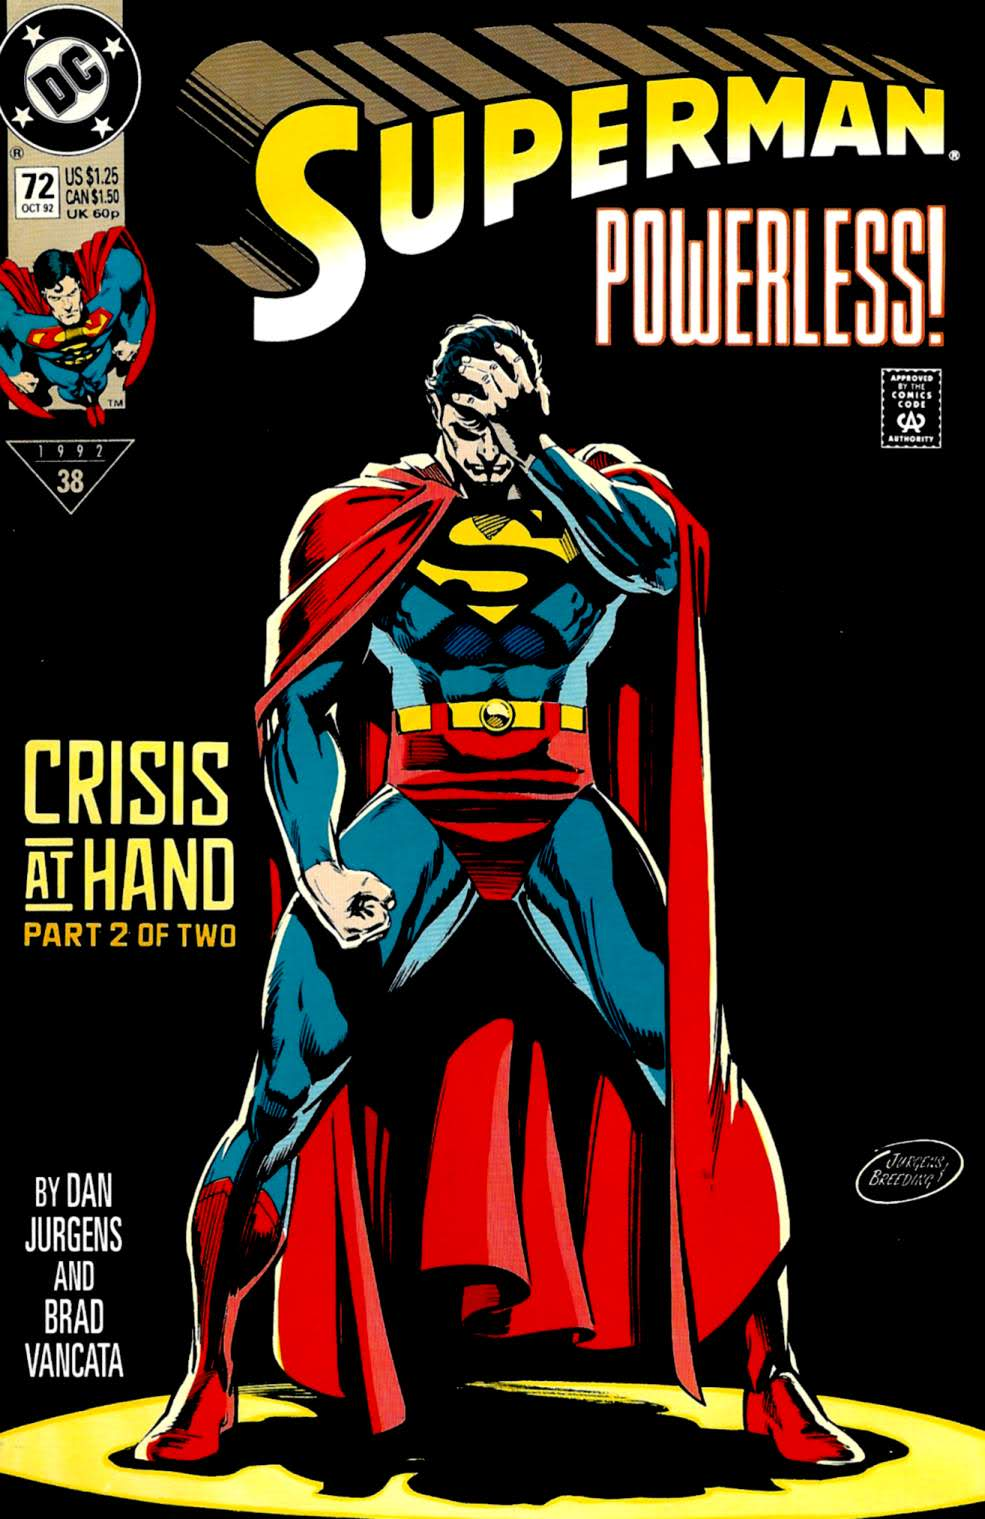 Cover art to Superman(vol. 2) #72, by Dan Jurgens and Brett Breeding.